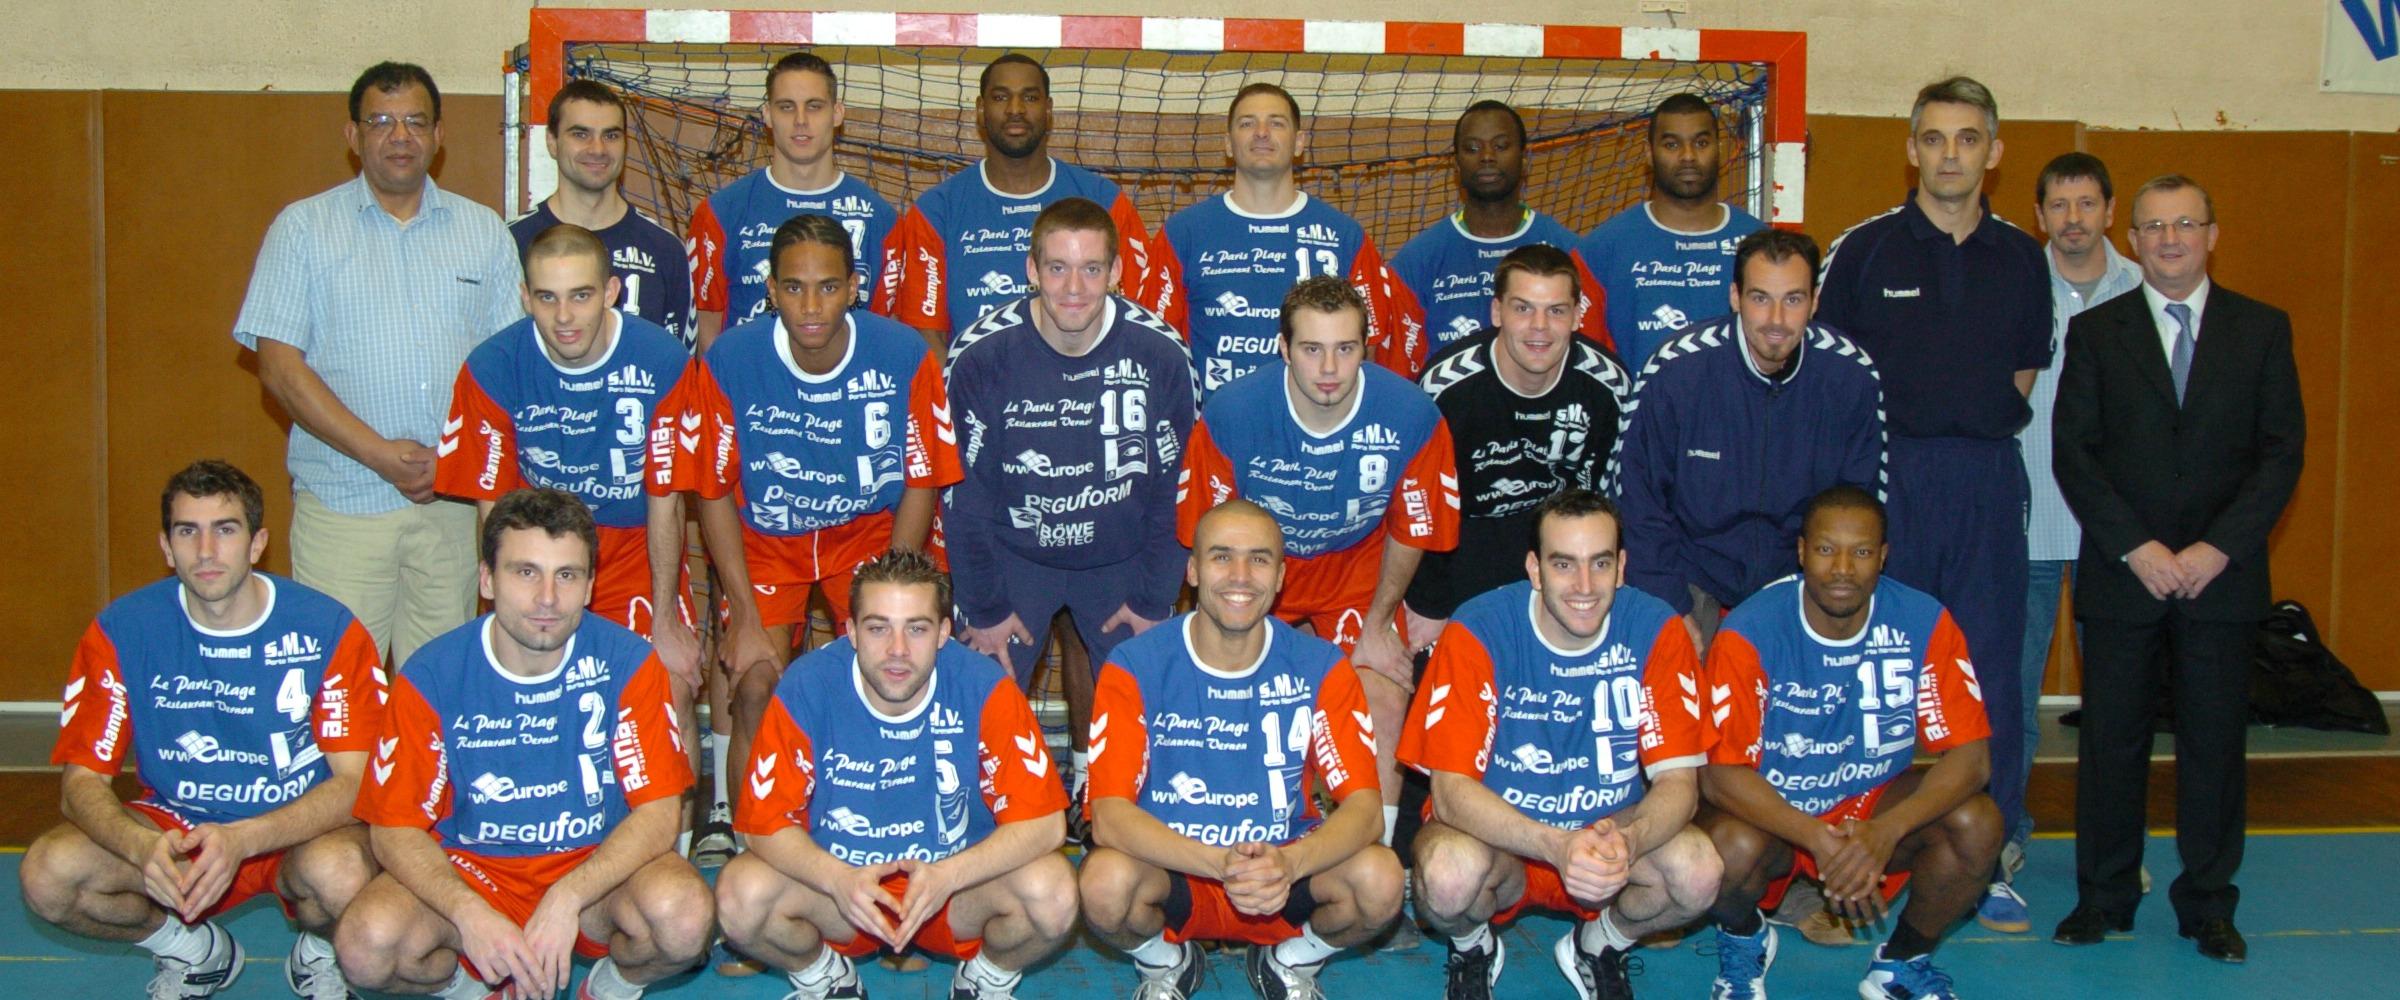 Slavisa Djukanovic - SMV Porte Normande - Equipe Handball Saison 2005-2006